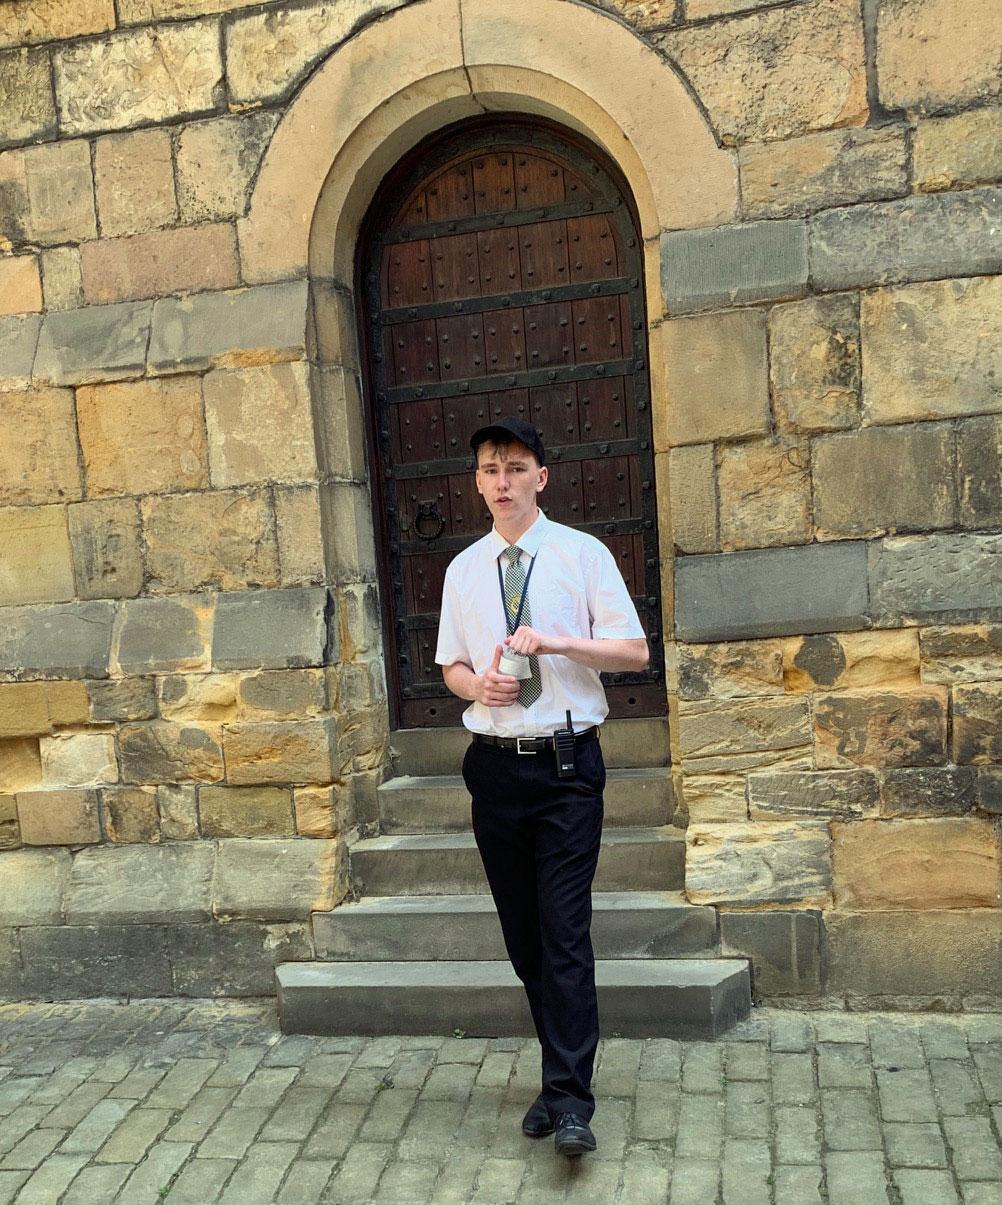 UK-Alnwick-Castle-tour-guide